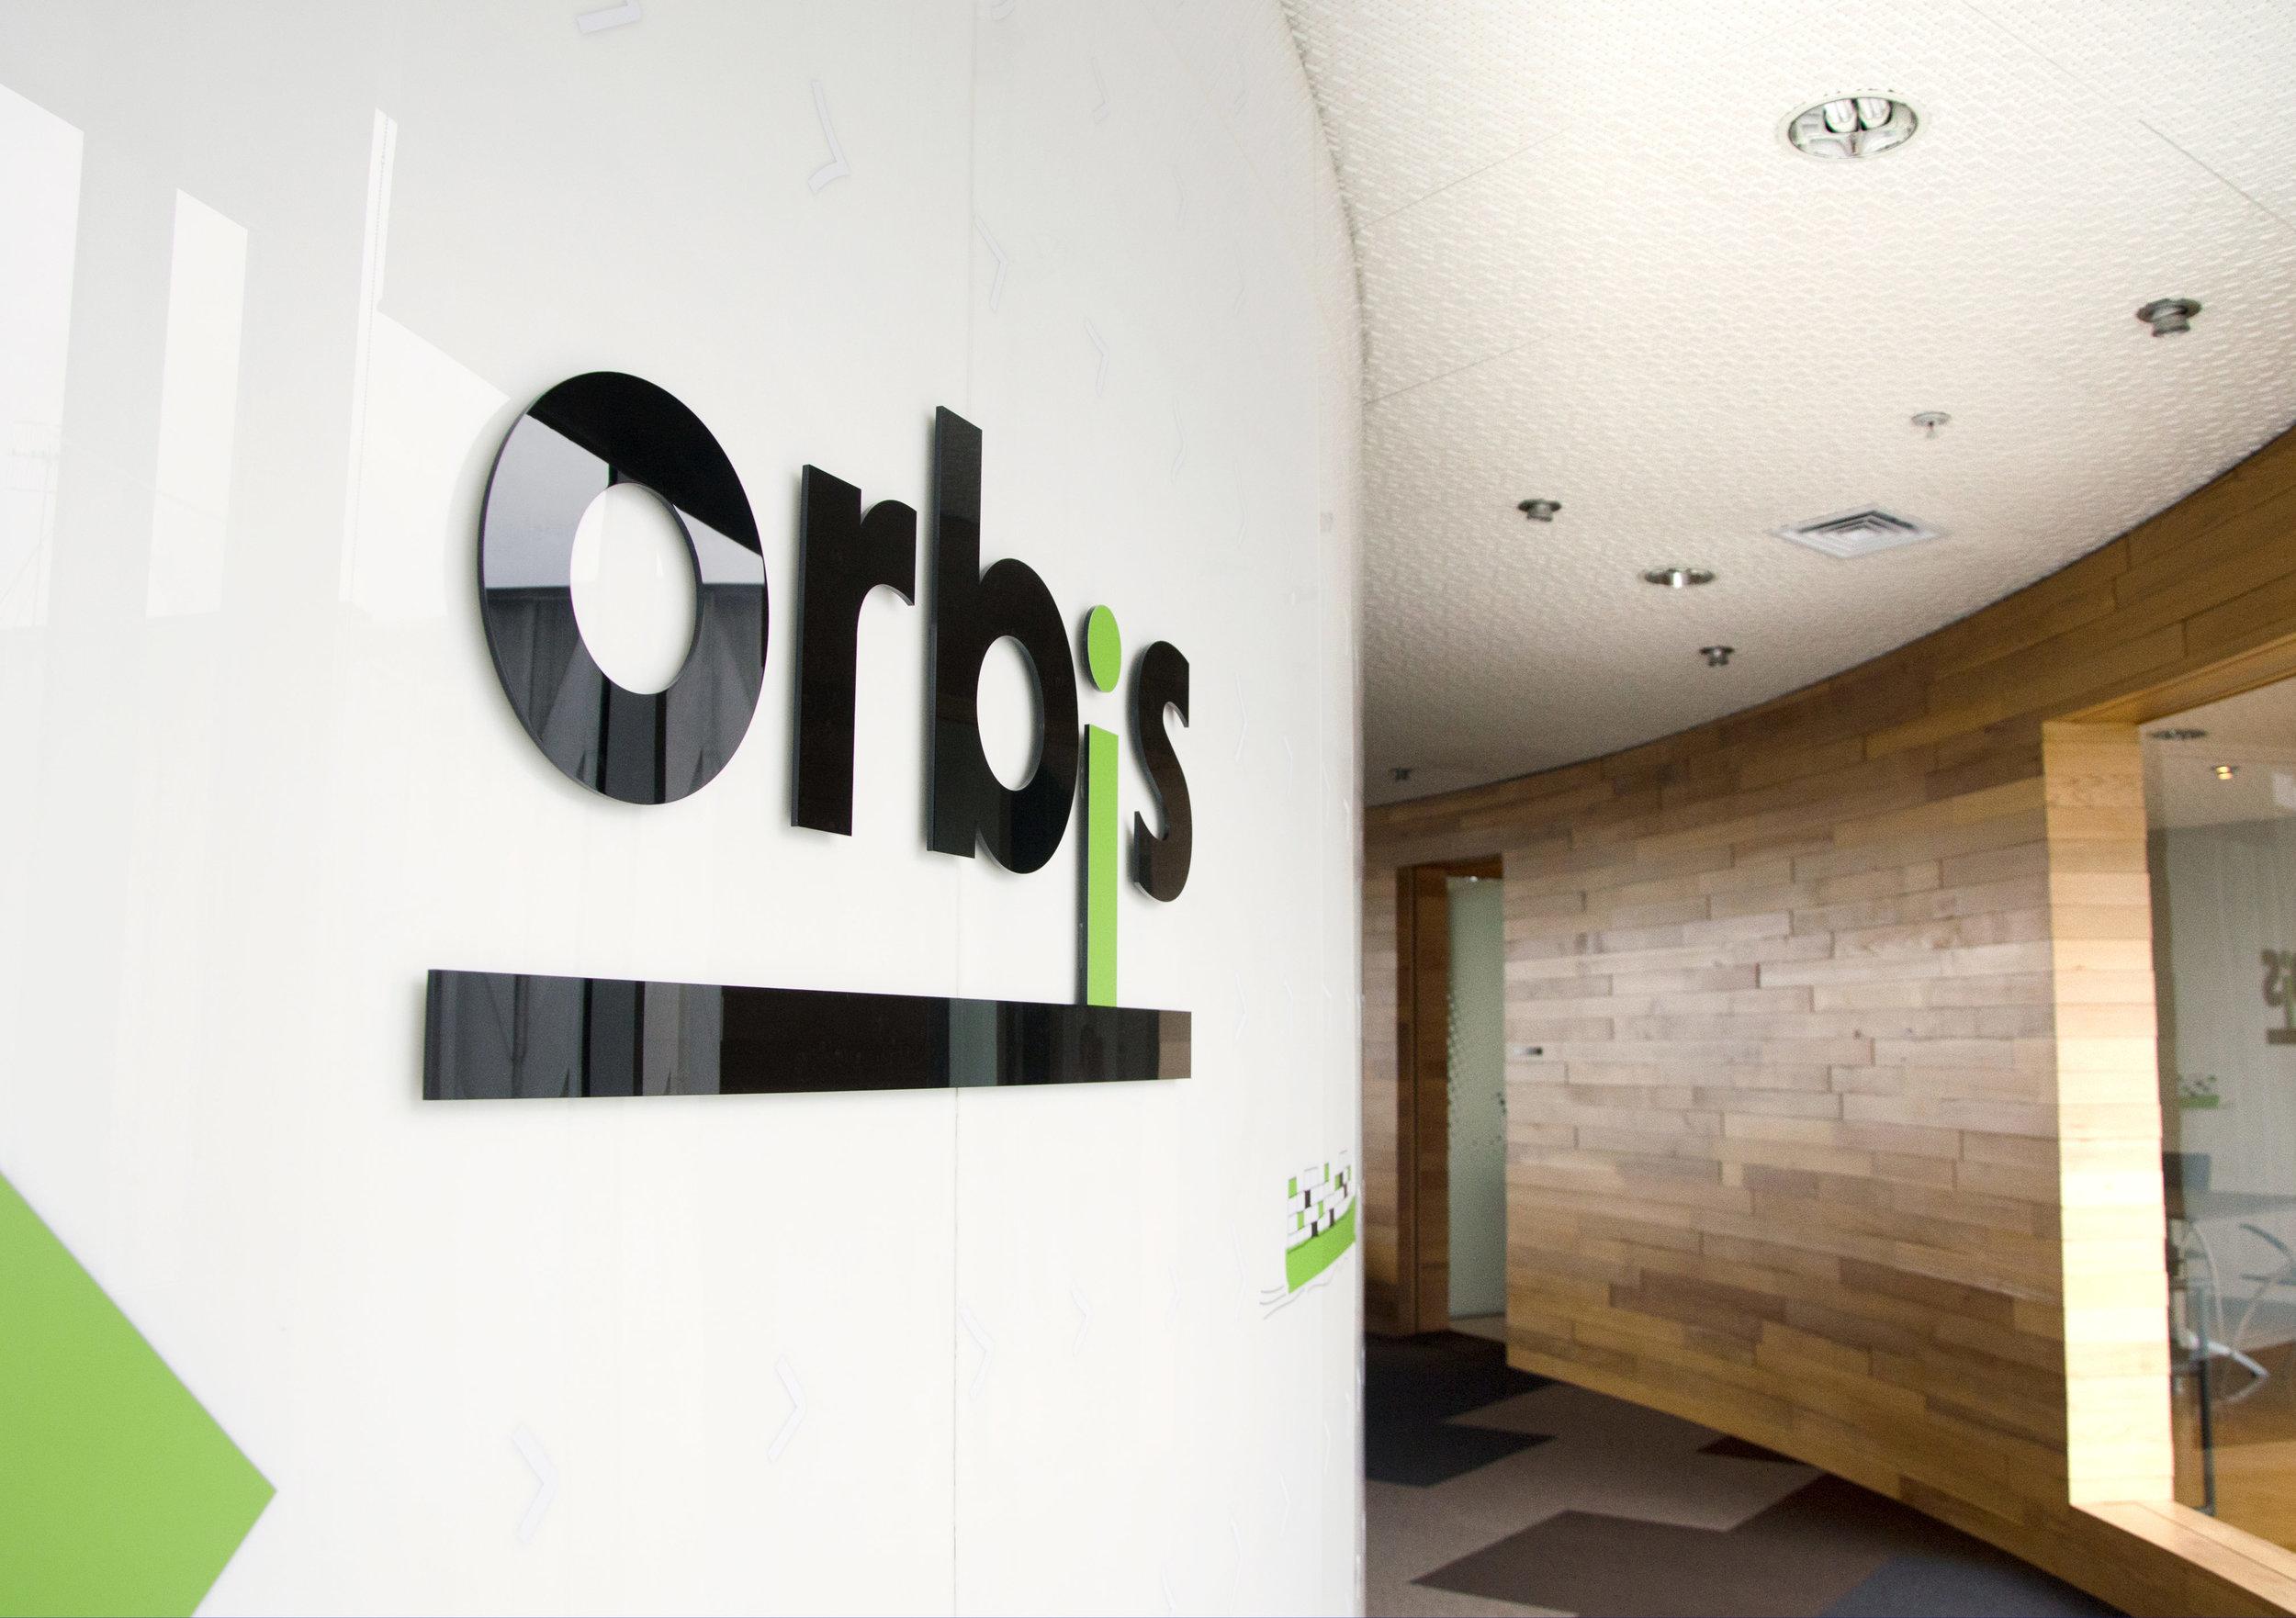 Orbis office signage